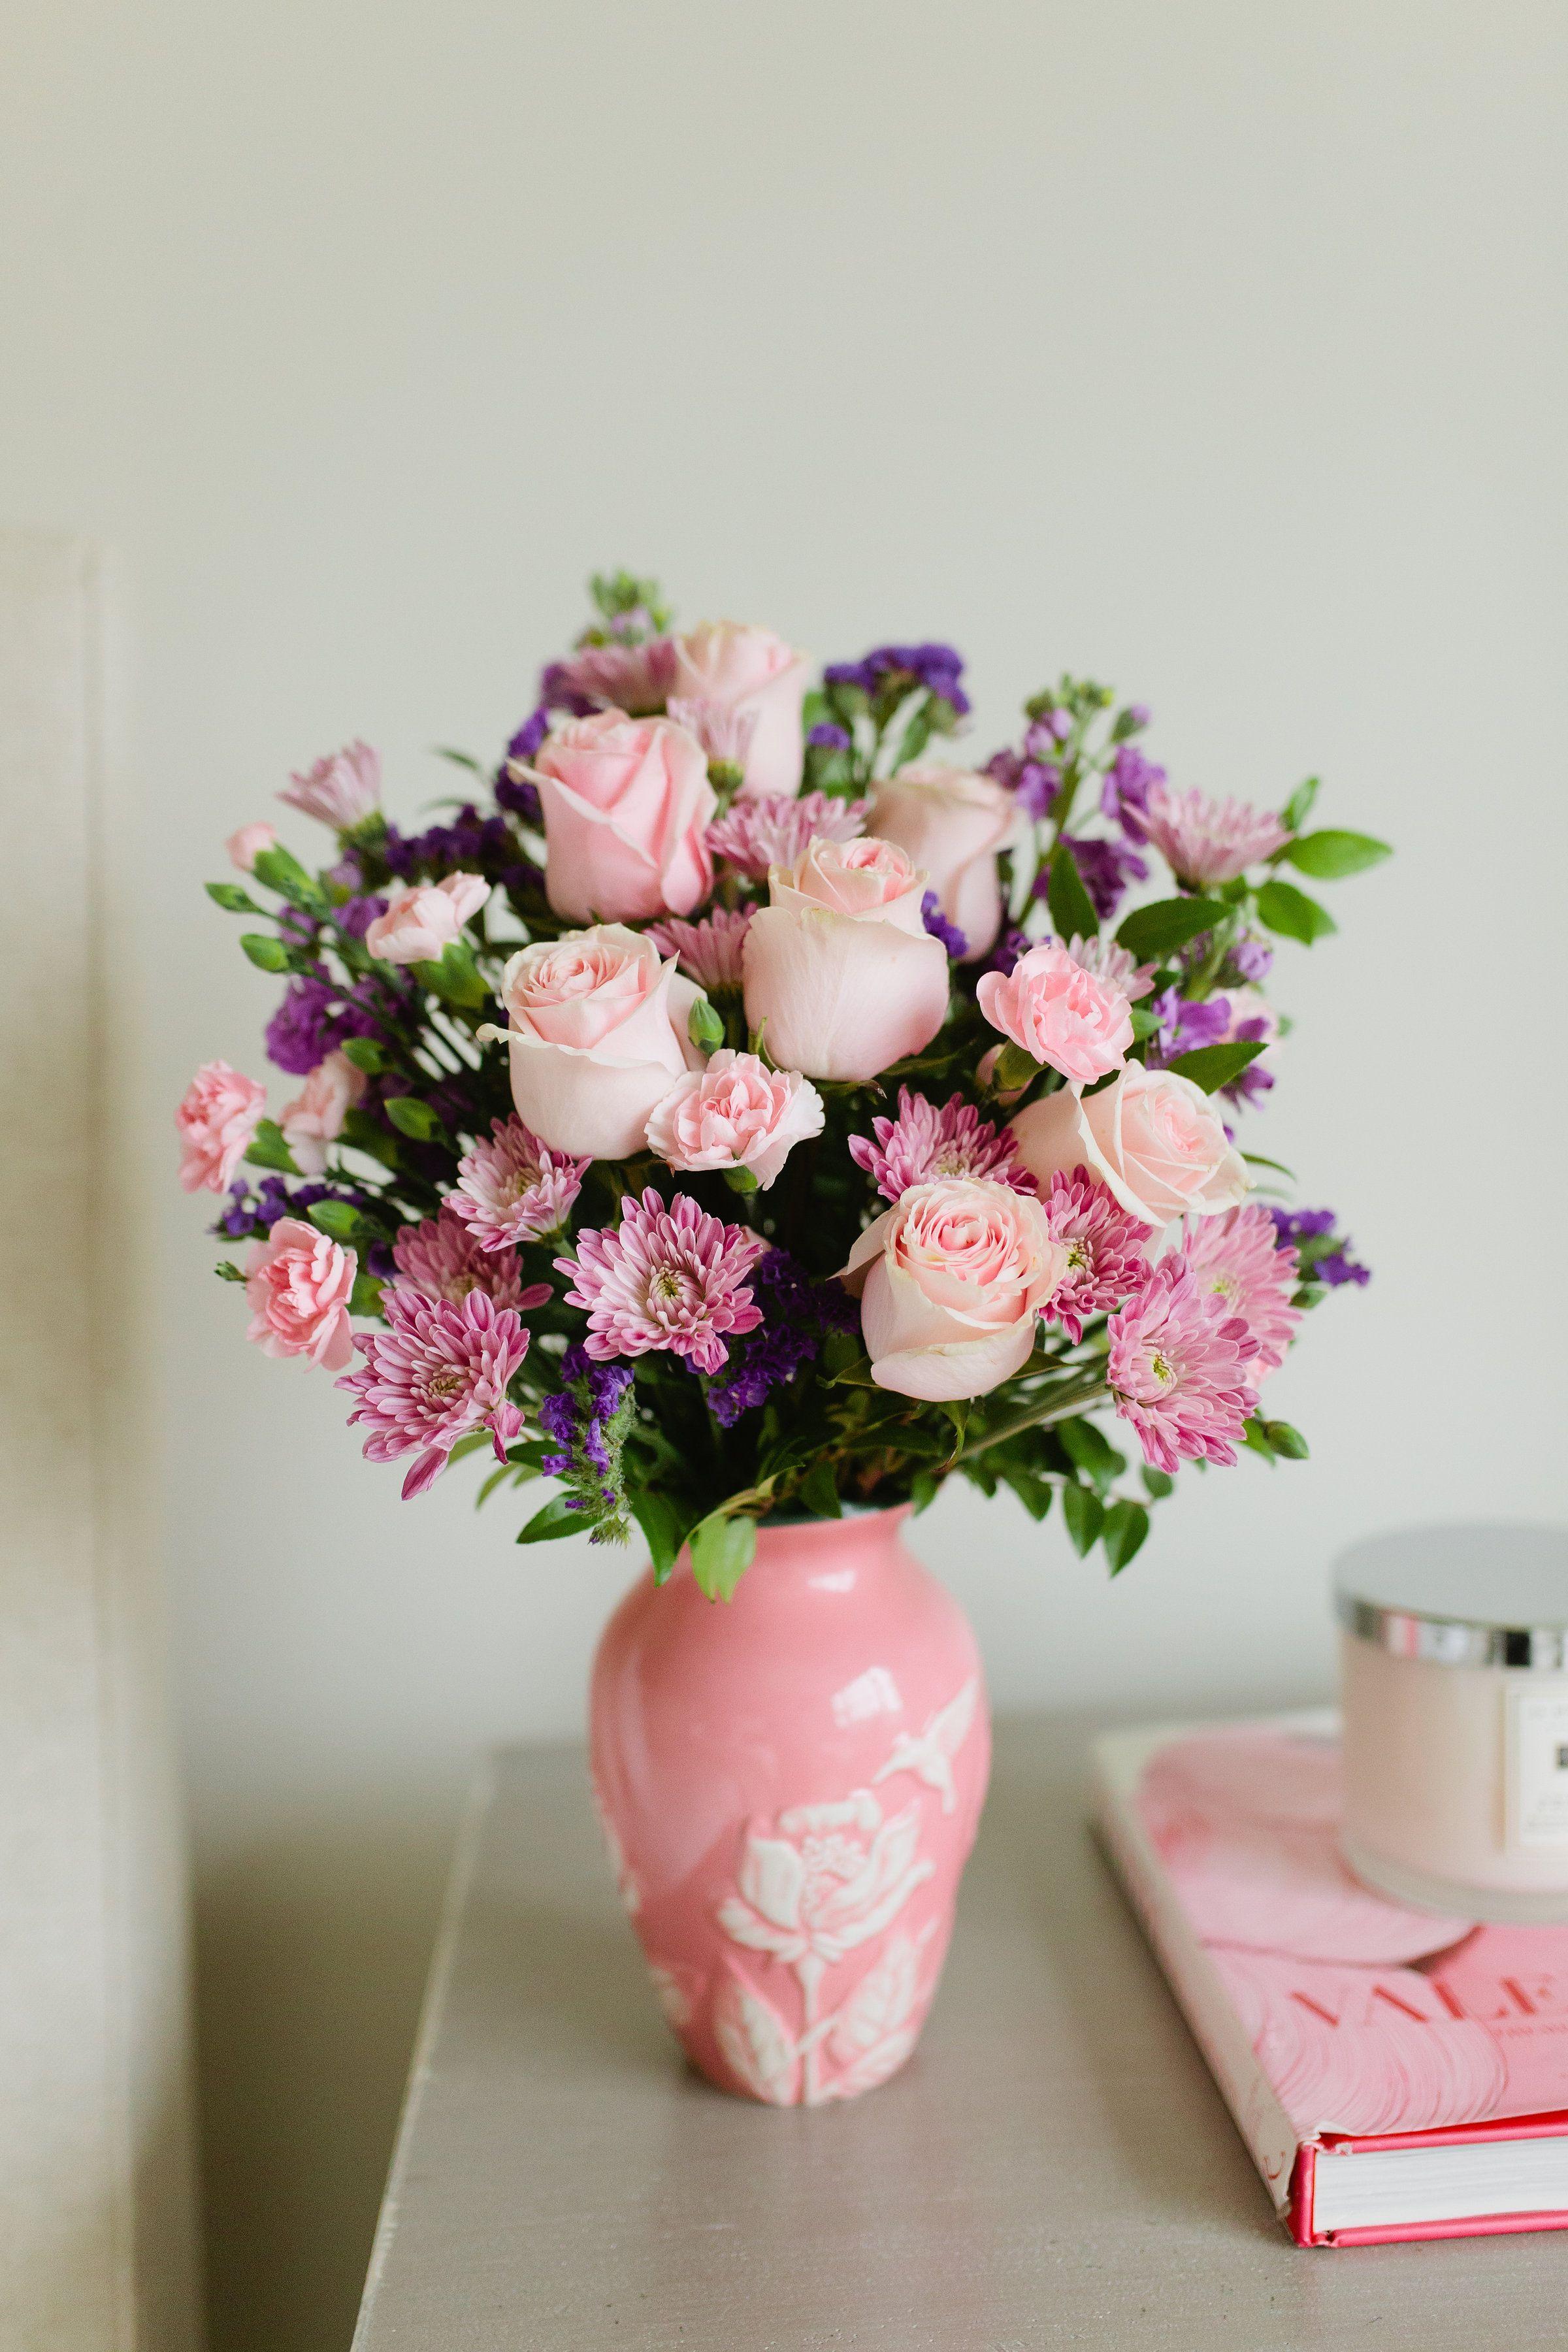 Pin By Nancy Keegan On Floral Arrangements Pinterest Flowers